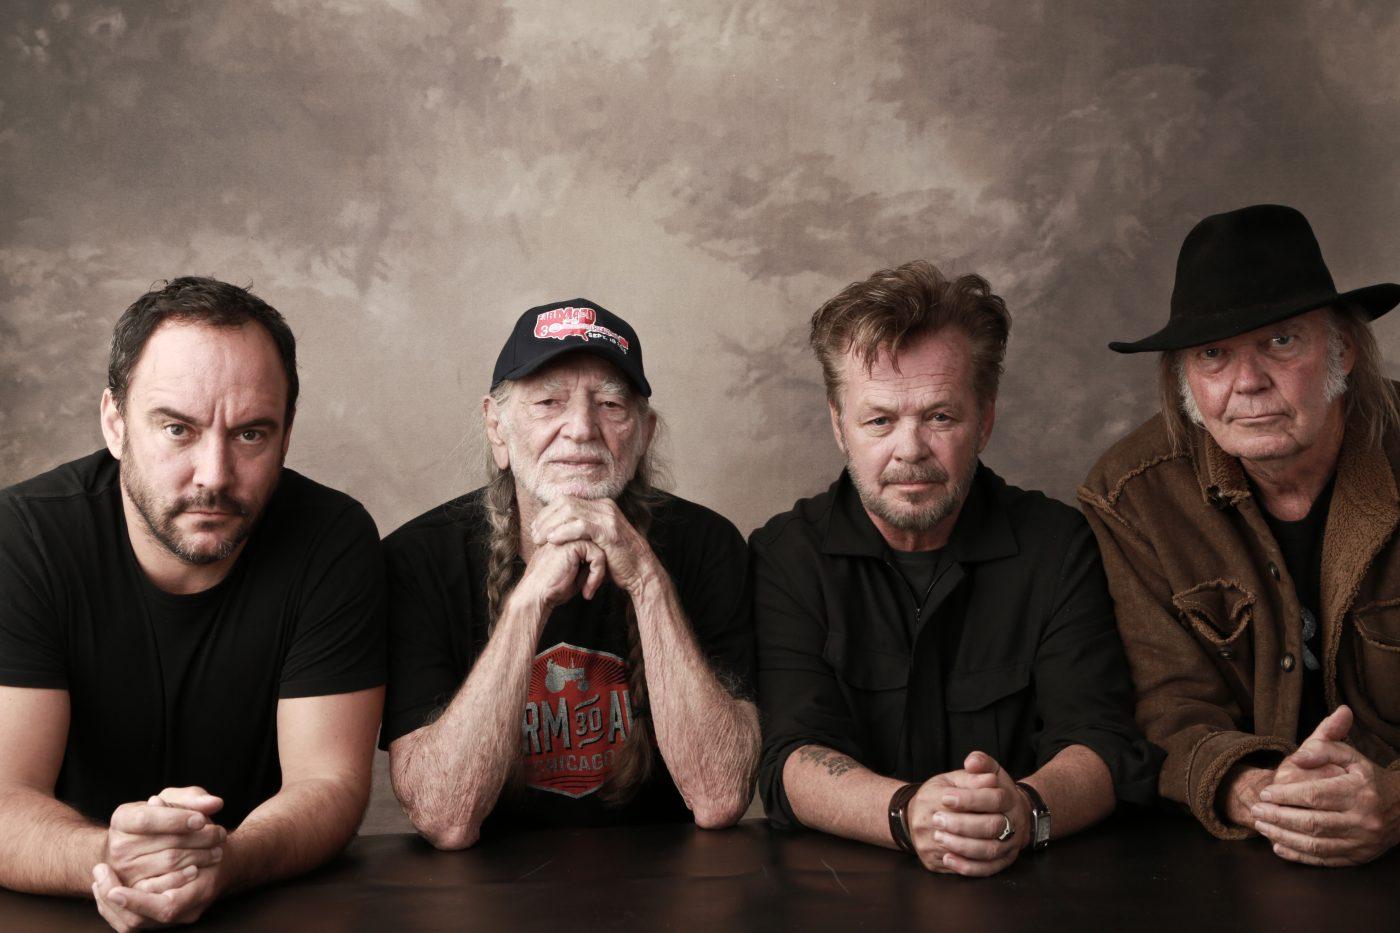 Dave Matthews(デイヴ・マシューズ)、Willie Nelson(ウィリー・ネルソン)、John Mellencamp(ジョン・メレンキャンプ)、Neil     Young(ニール・ヤング)